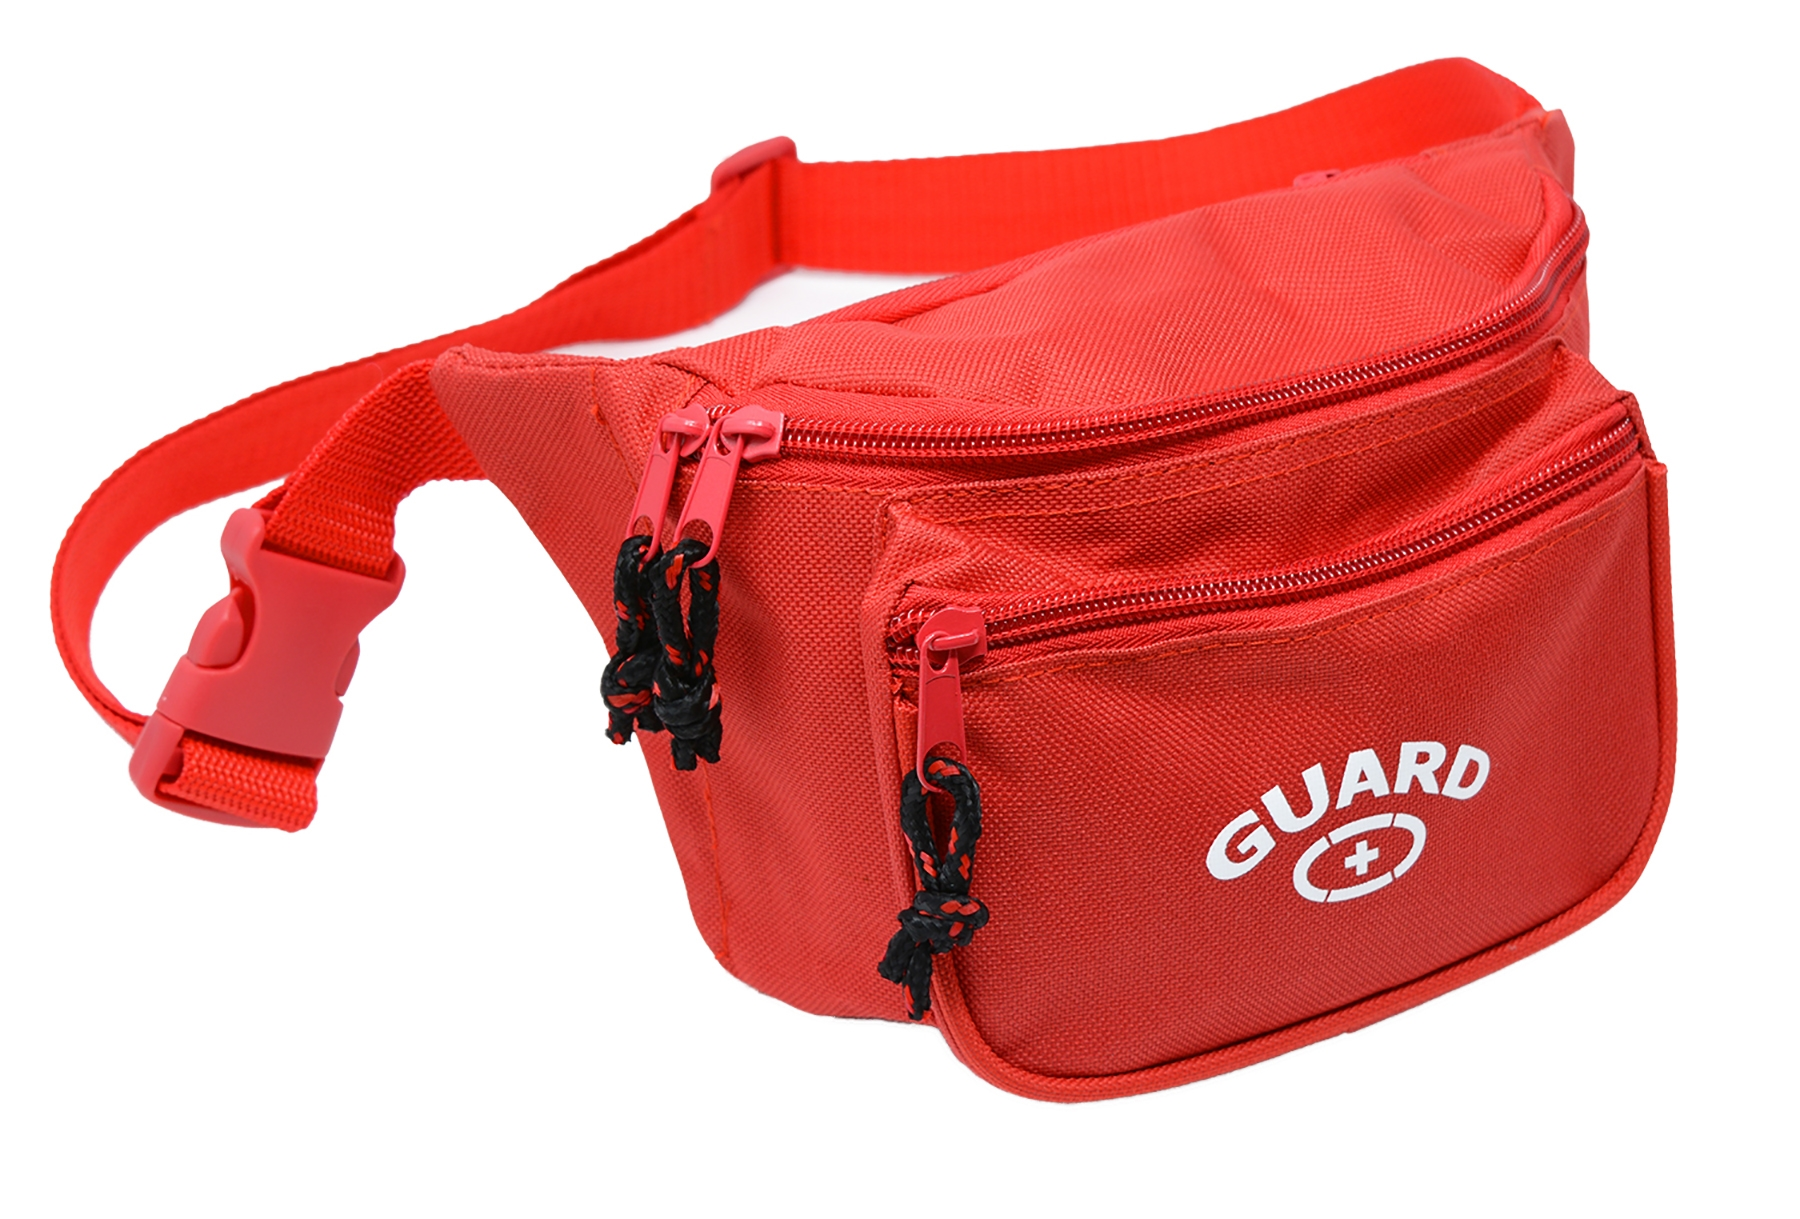 bfa9fc380b4 Adoretex Lifeguard Fanny Pack Whistle with Lanyard Equipment Set at ...